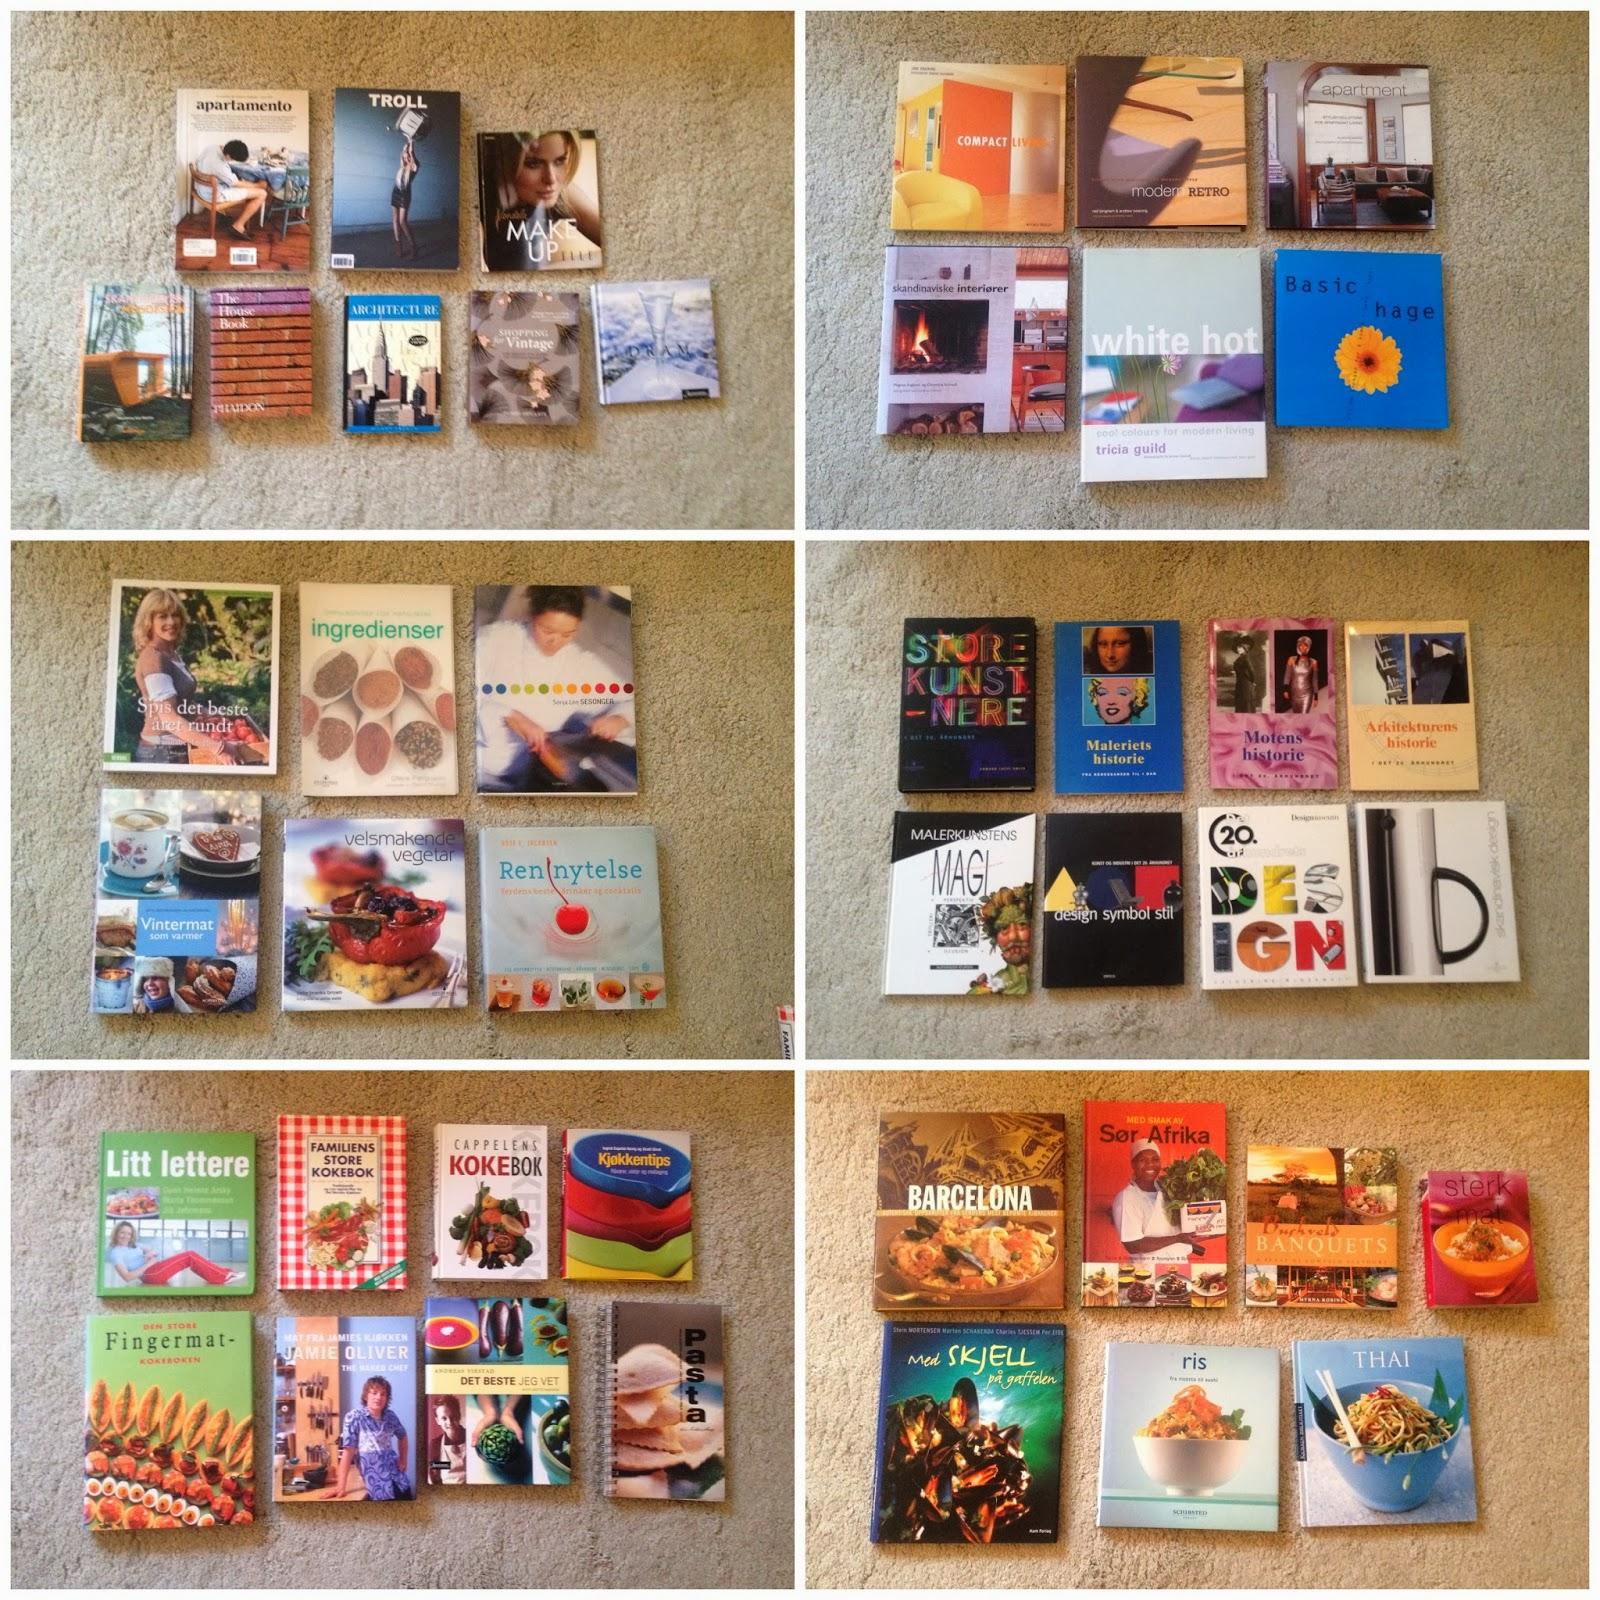 Interior Design Books And Cookbooks For Sale